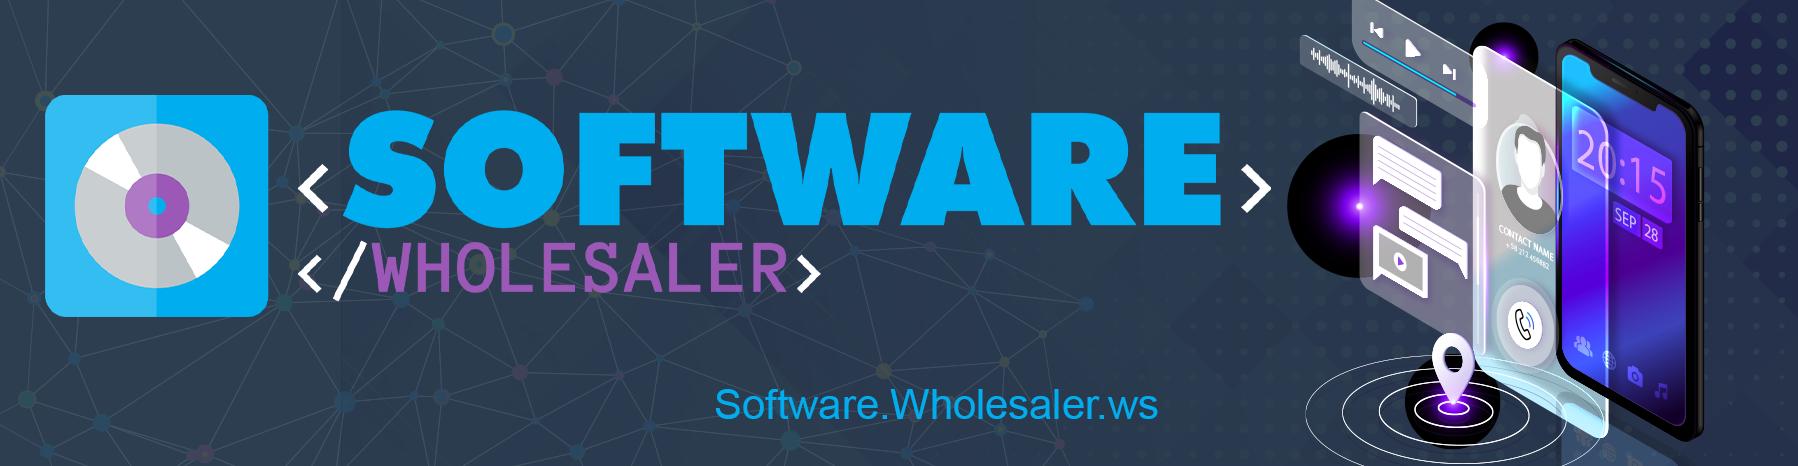 App Wholesaler header image